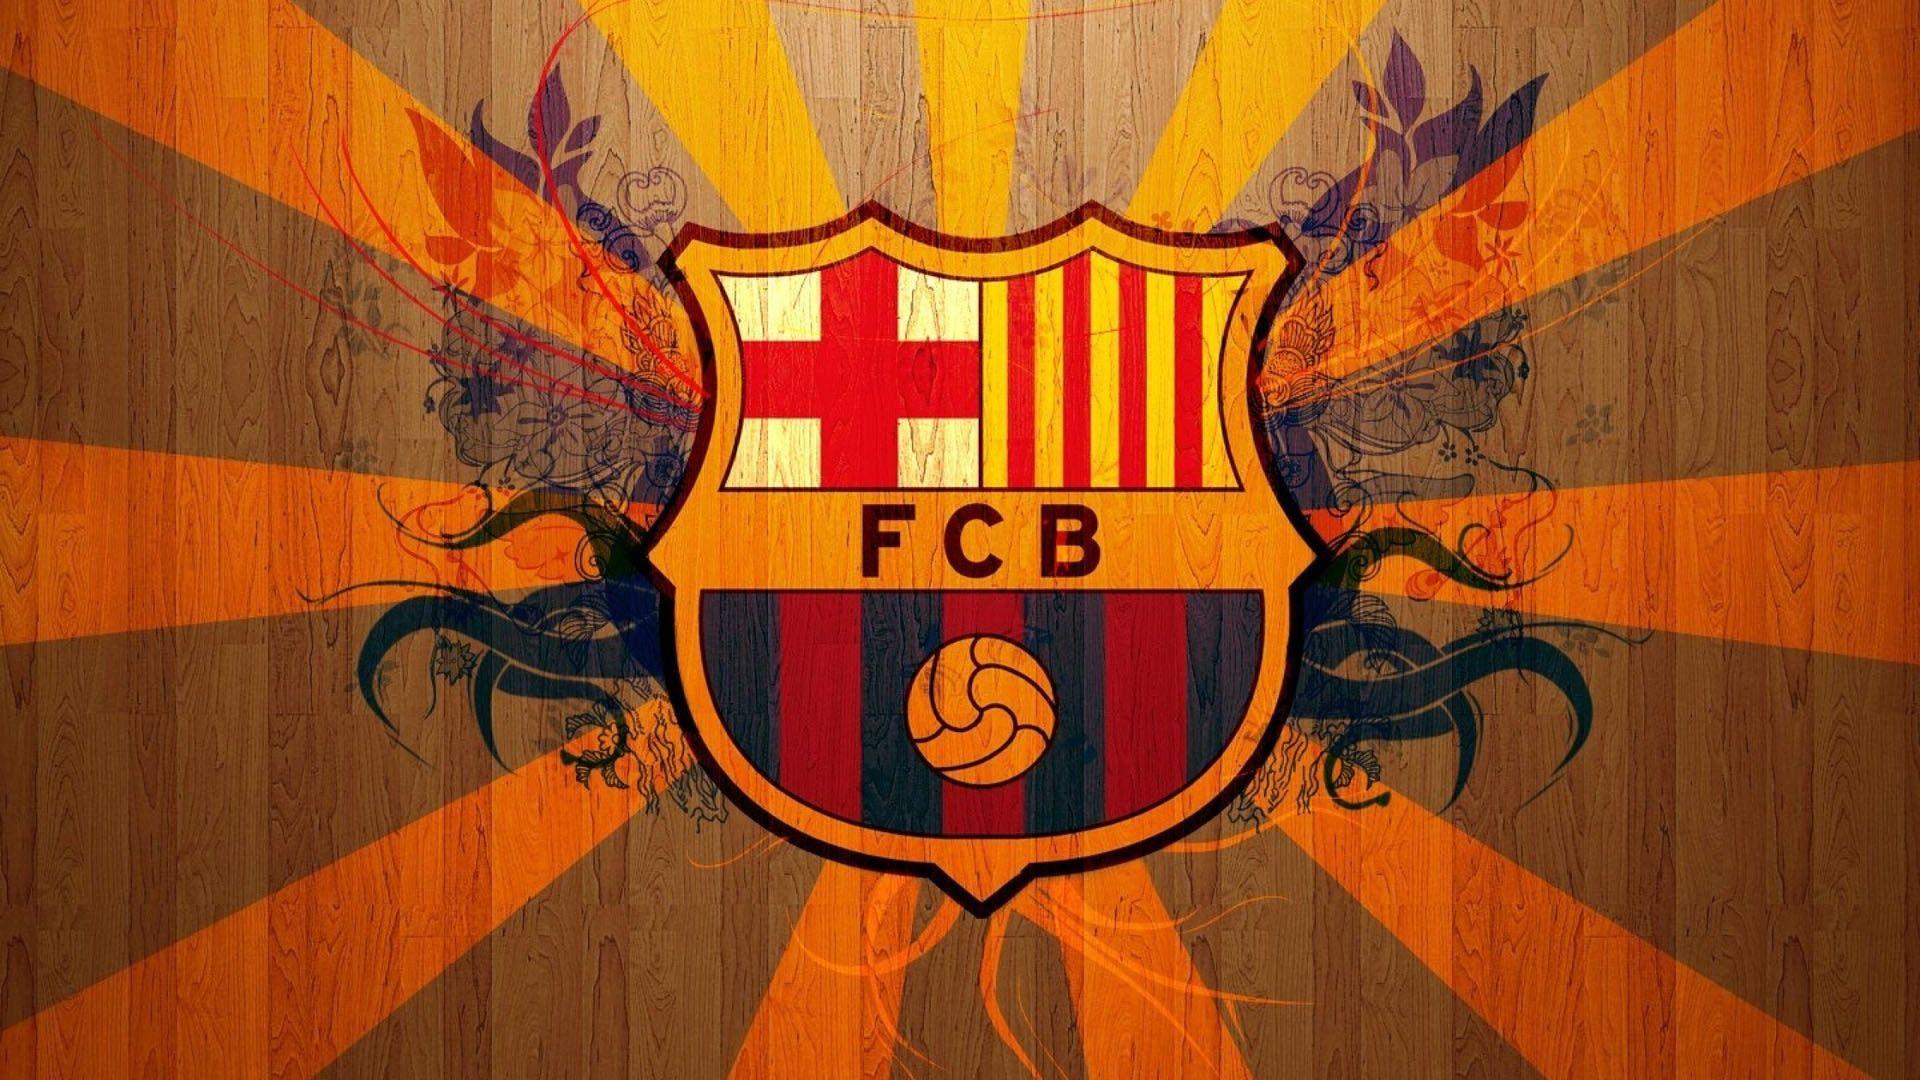 Barcelona Wallpaper for iPhone